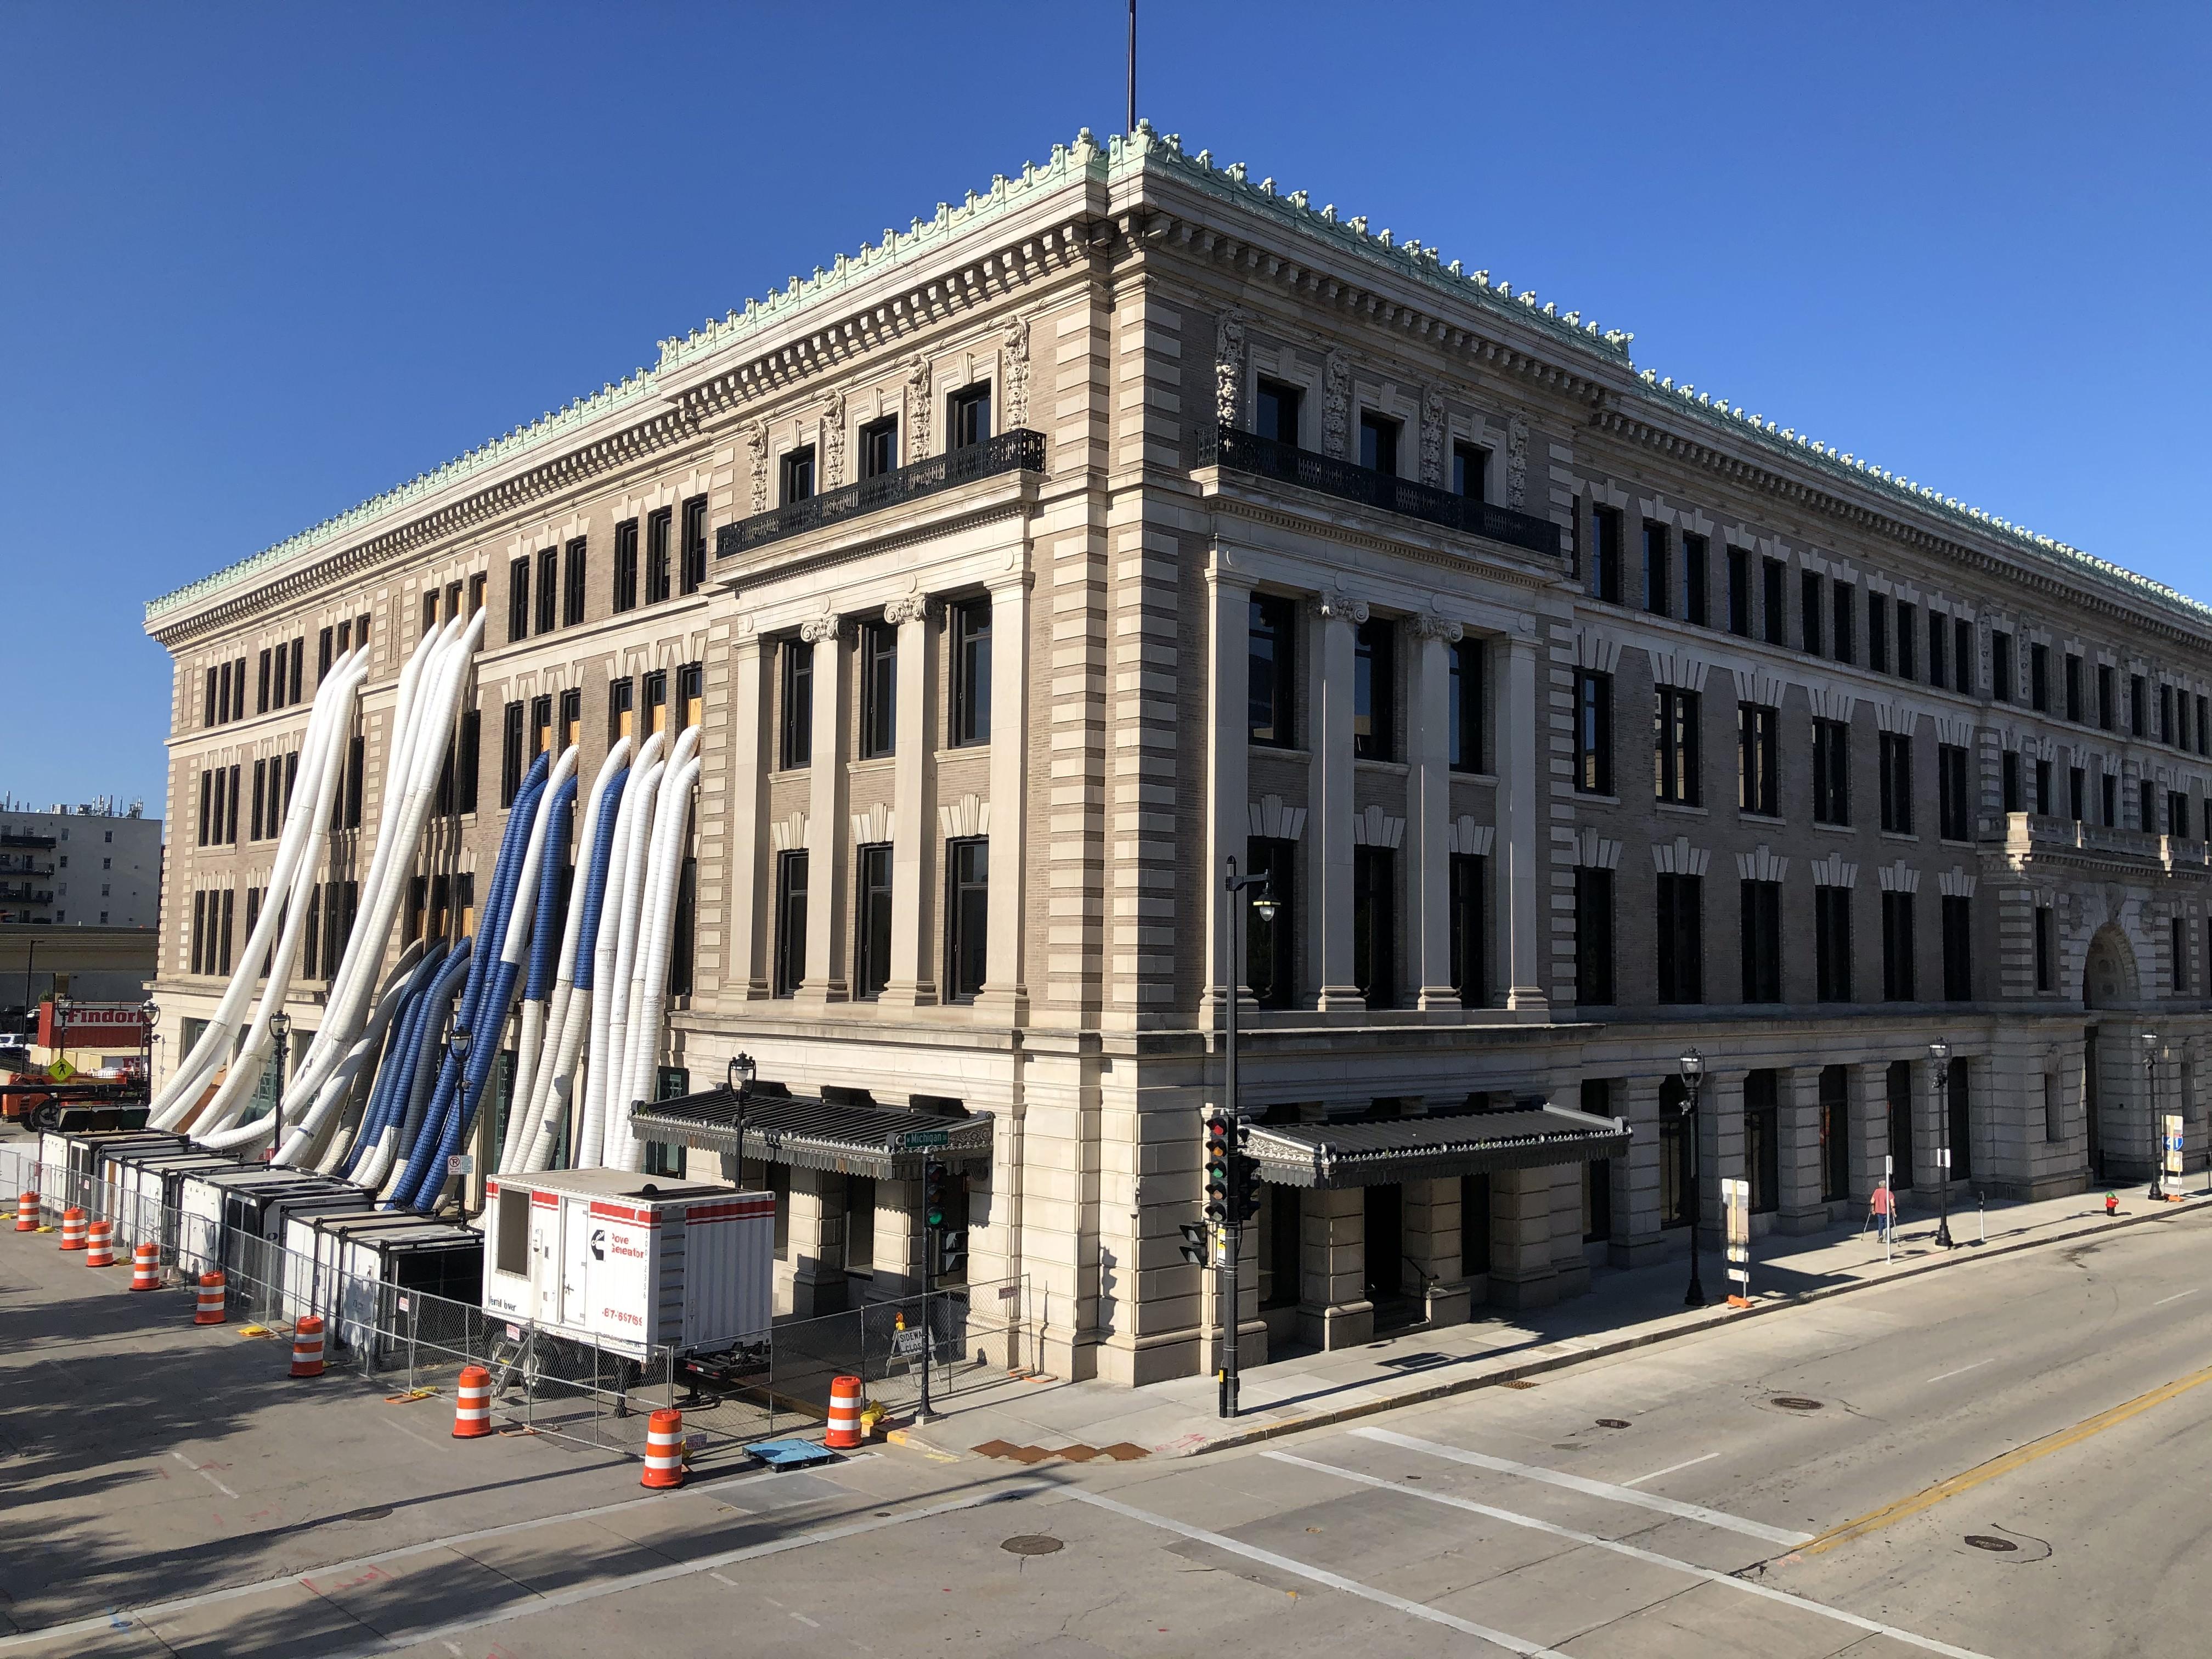 The Public Service Building in August 2020. Photo by Jeramey Jannene.